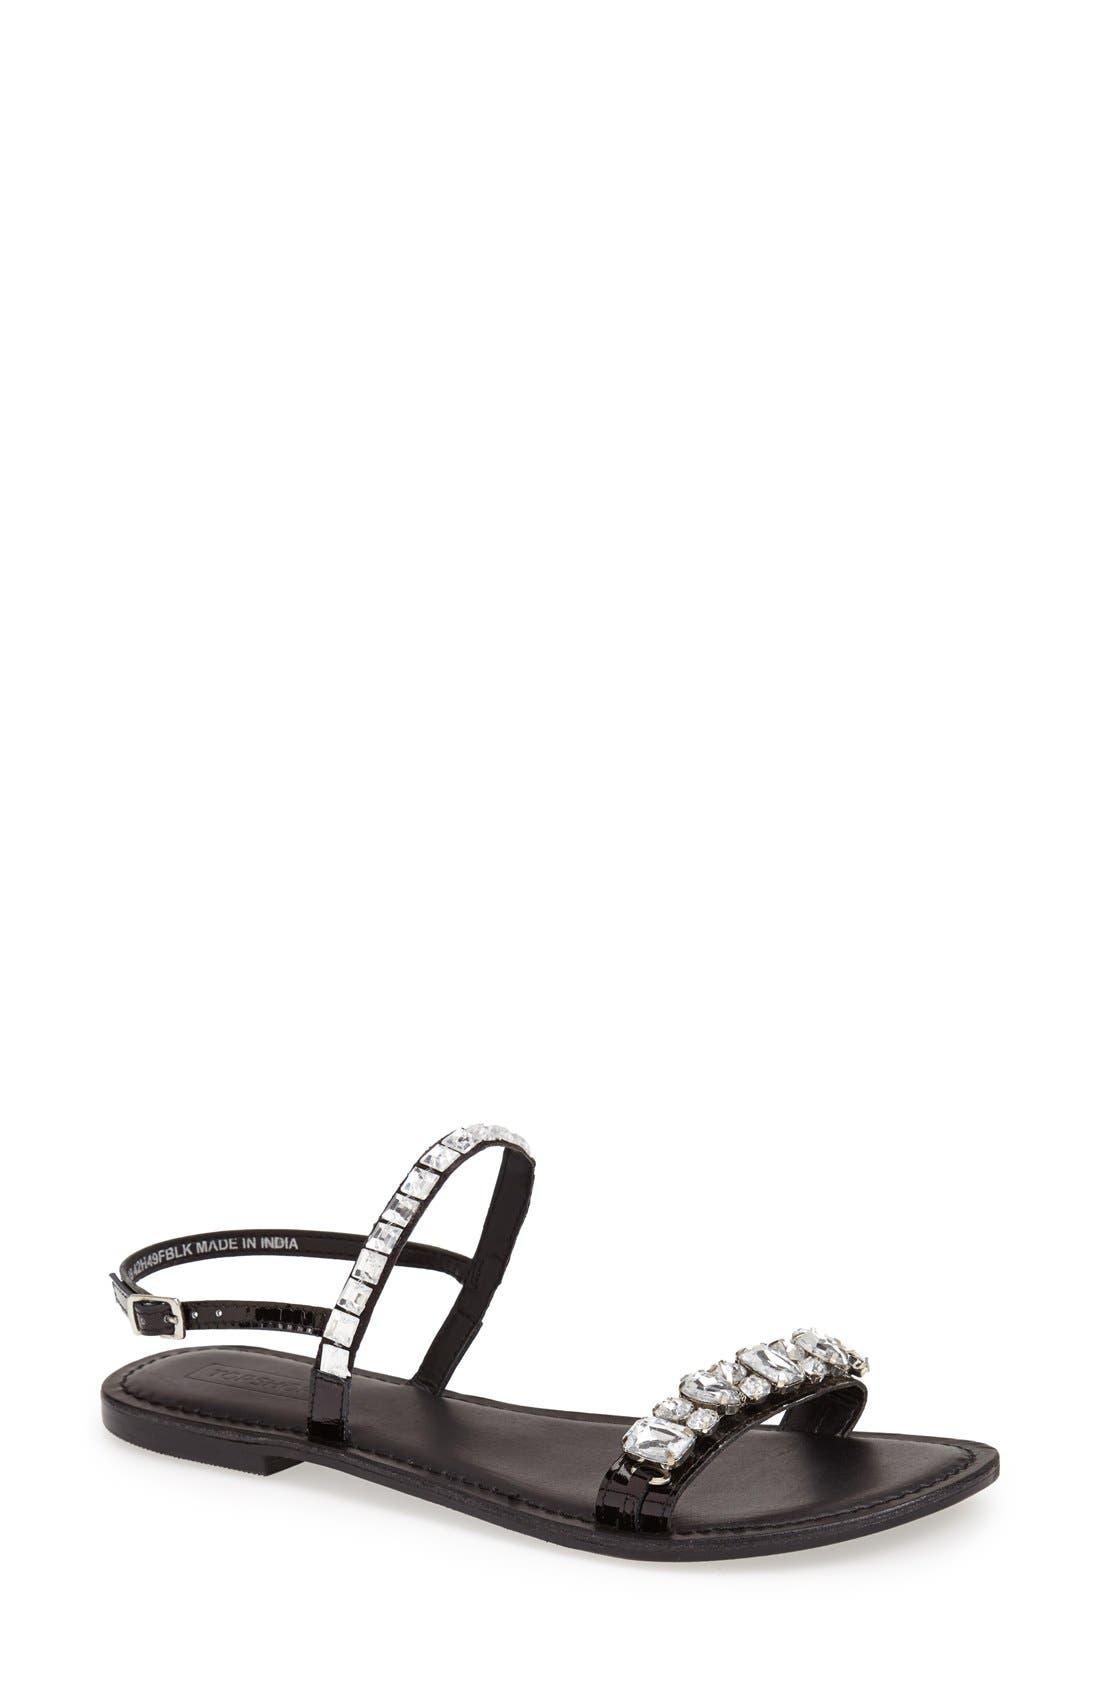 Main Image - Topshop 'Harn' Embellished Sandal (Women)